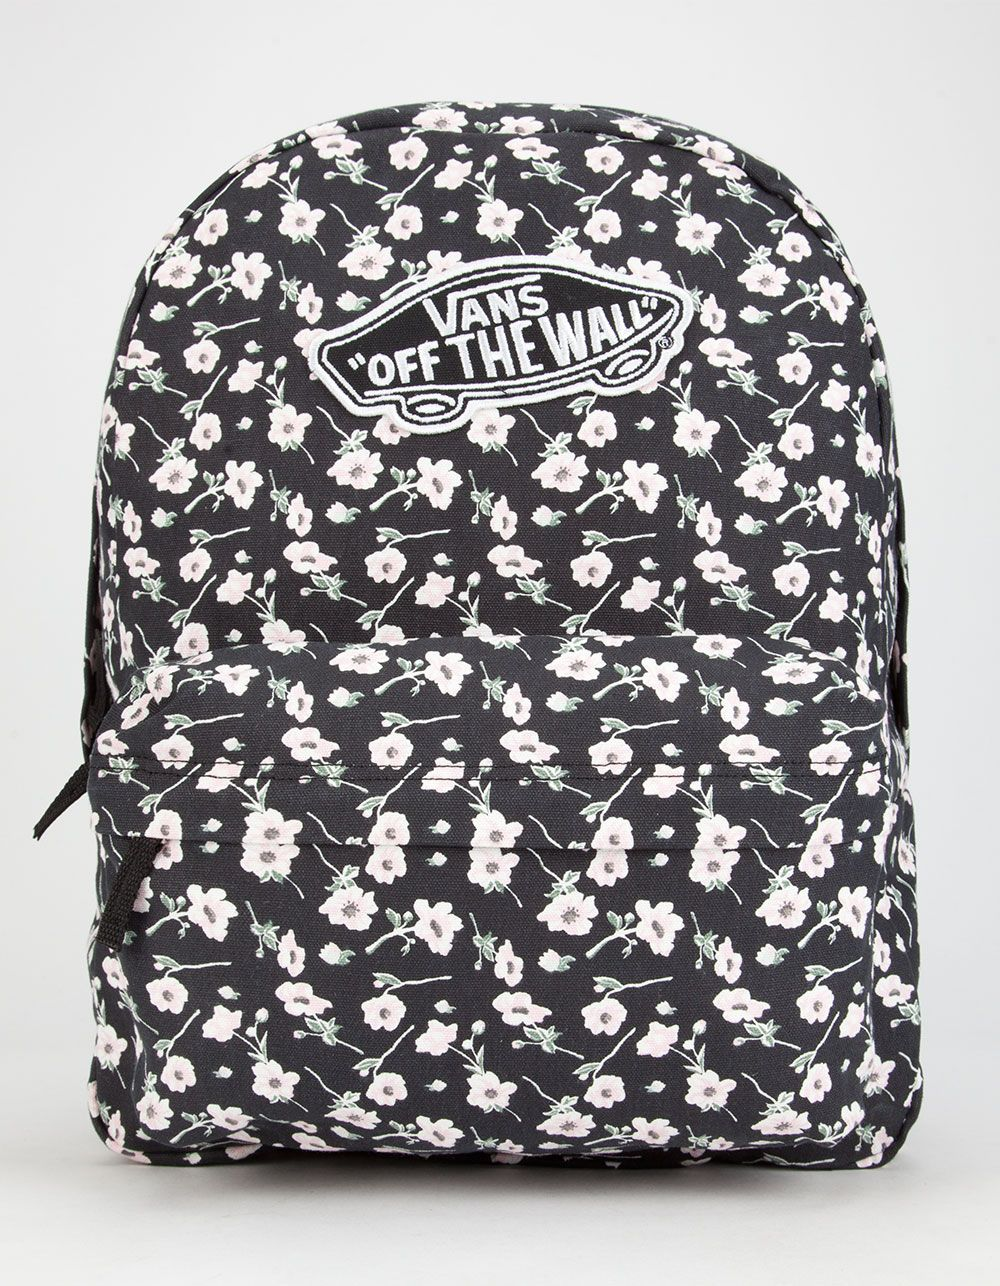 vans off the wall backpack black